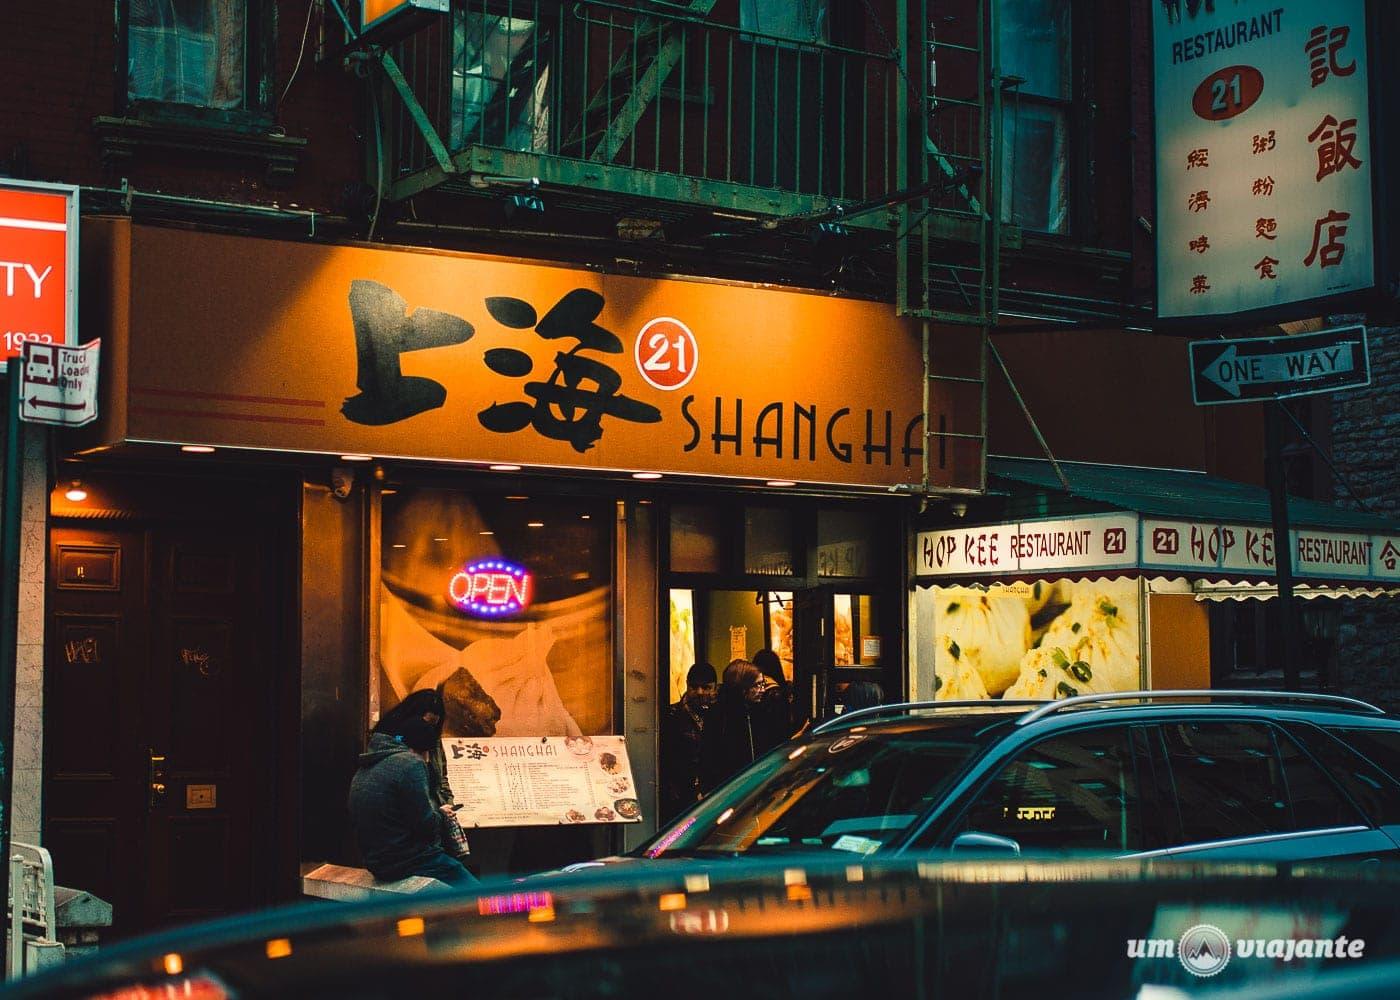 Shanghai 21 - Restaurante em Chinatown - Roteiro NYC